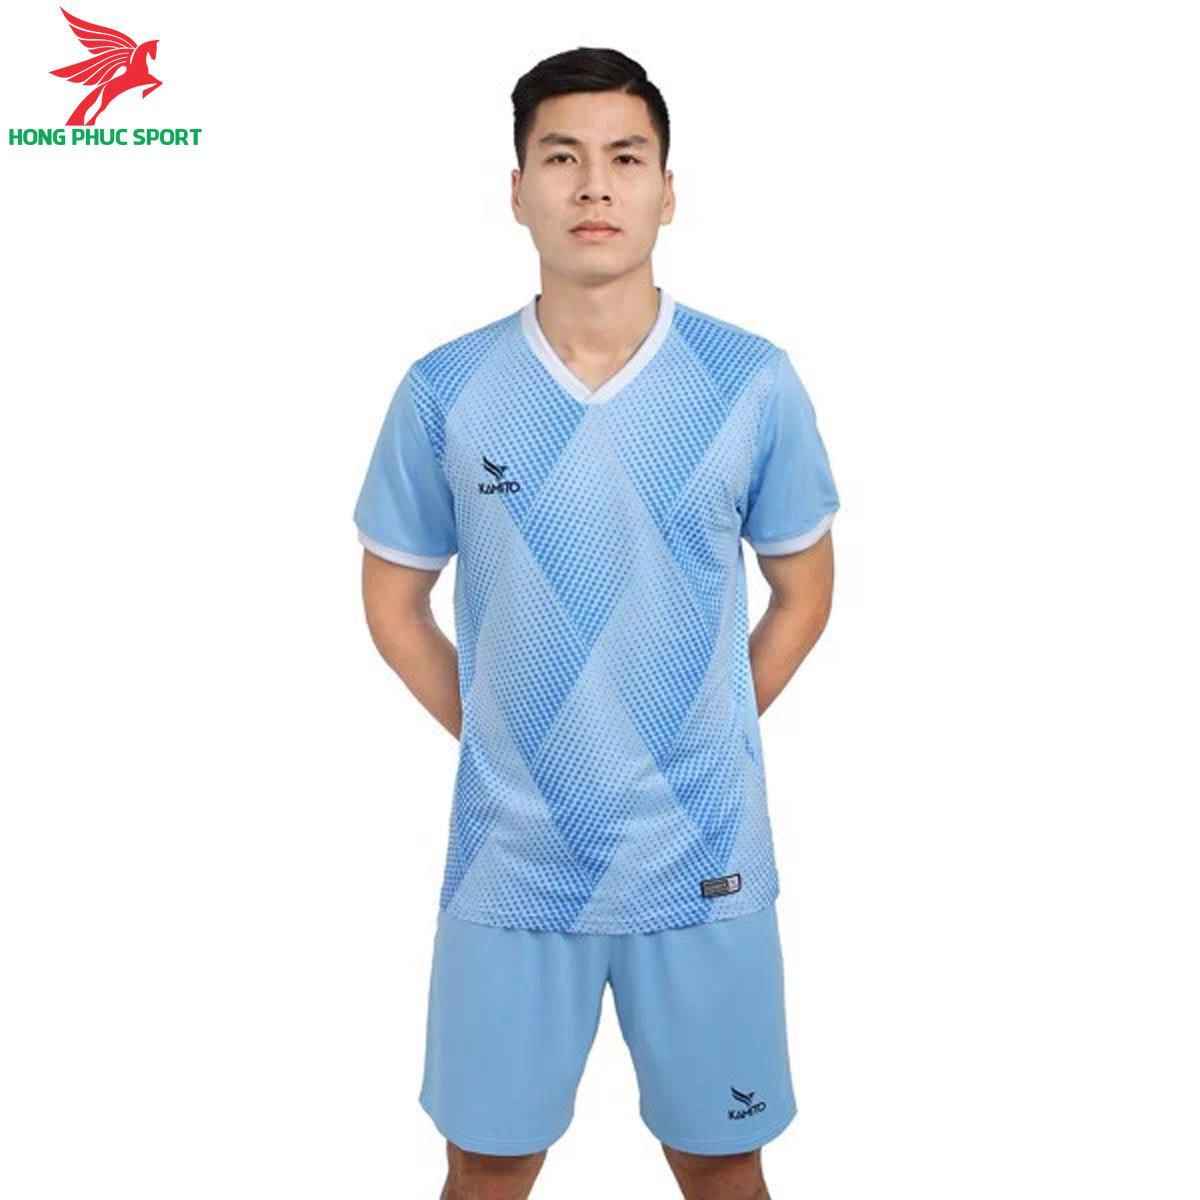 https://cdn.hongphucsport.com/unsafe/s4.shopbay.vn/files/285/ao-khong-logo-kamito-msh2101-mau-xanh-bien-1-6052dc073805d.jpg